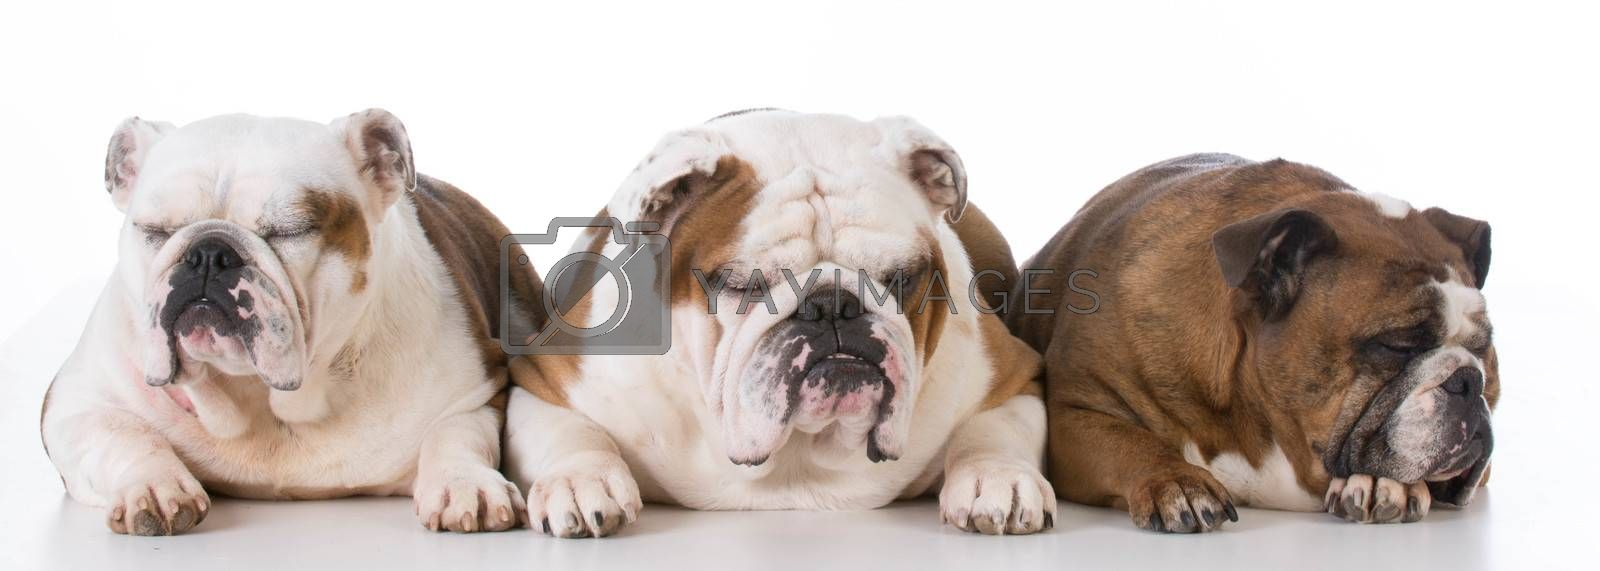 three english bulldogs sleeping on white background